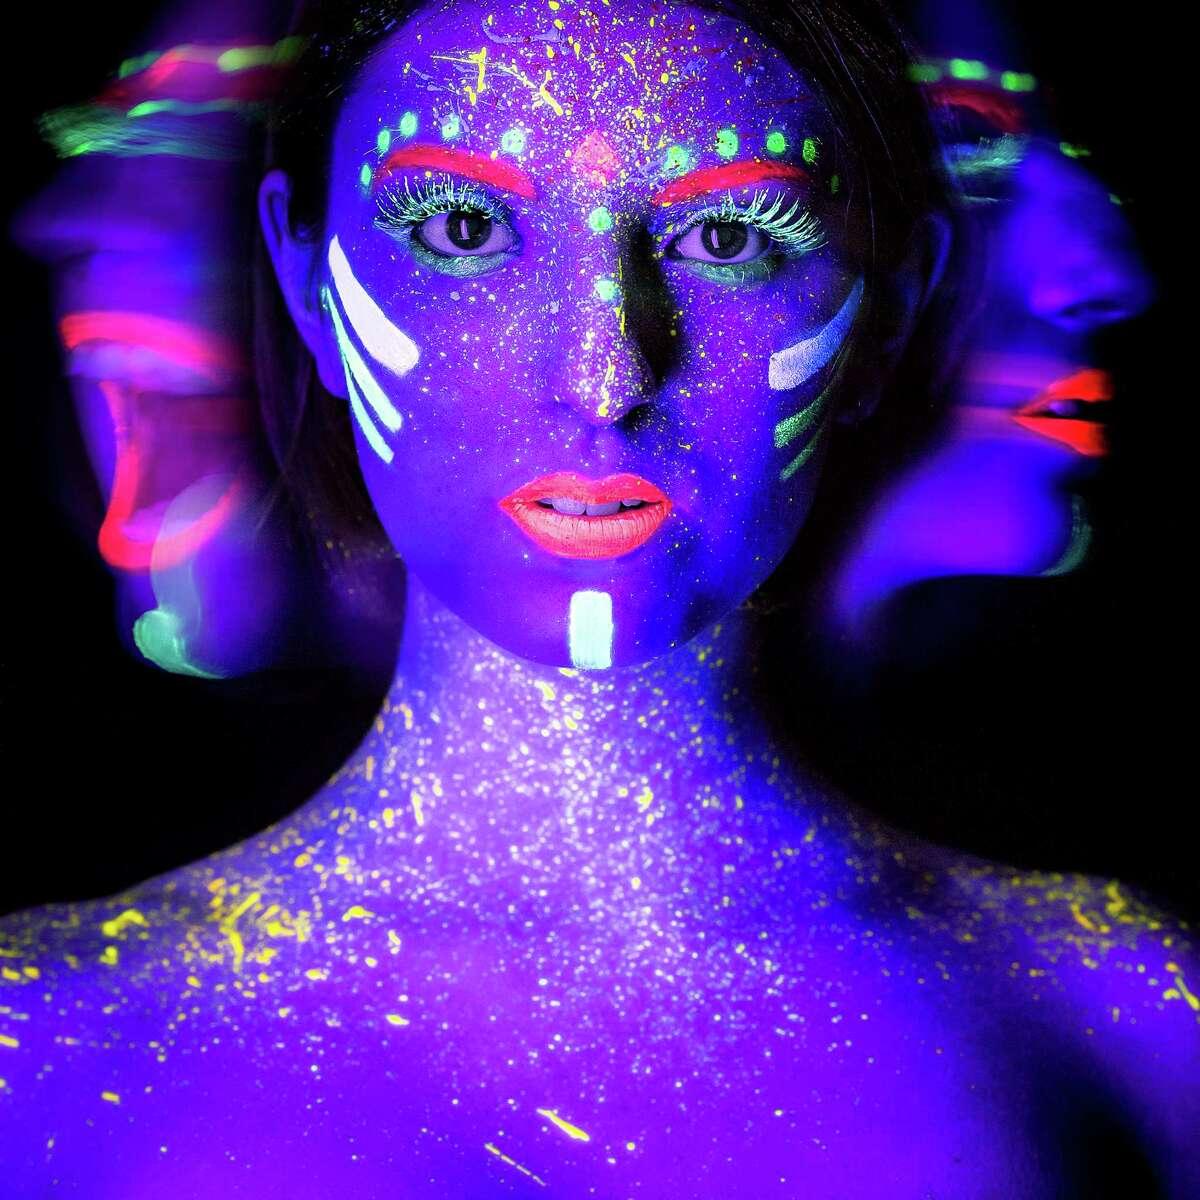 Merilette released her debut album Mindpaint